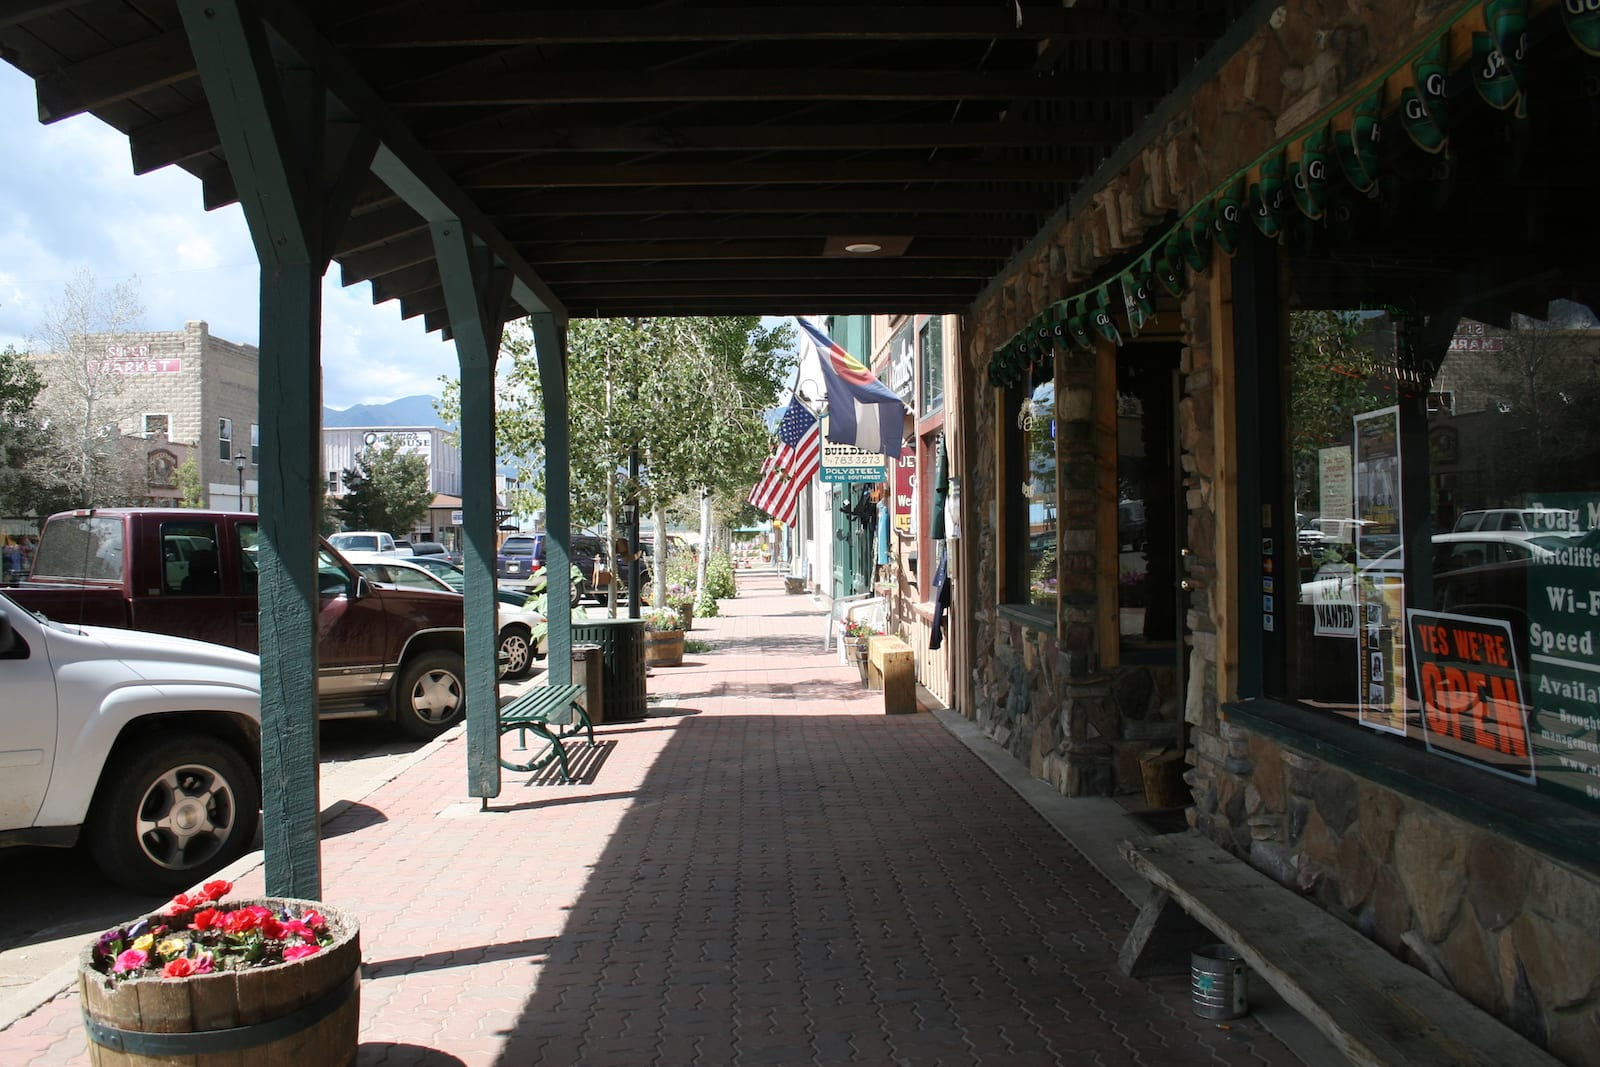 Westcliffe CO Downtown Main Street